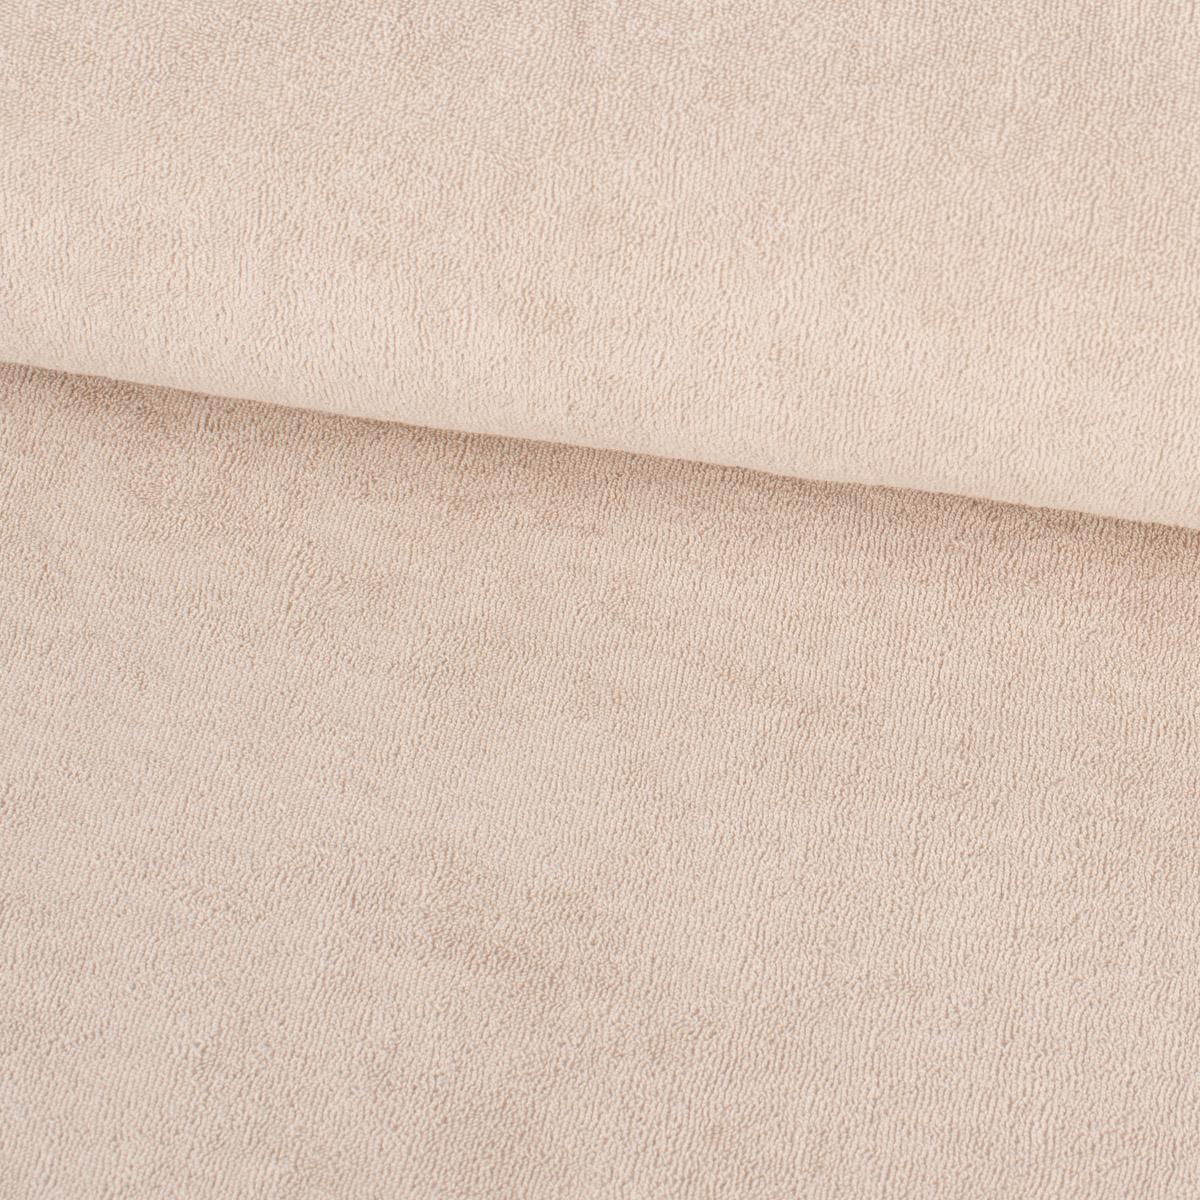 Frotteestoff Stretch Frottee einfarbig rosa 1,5m Breite